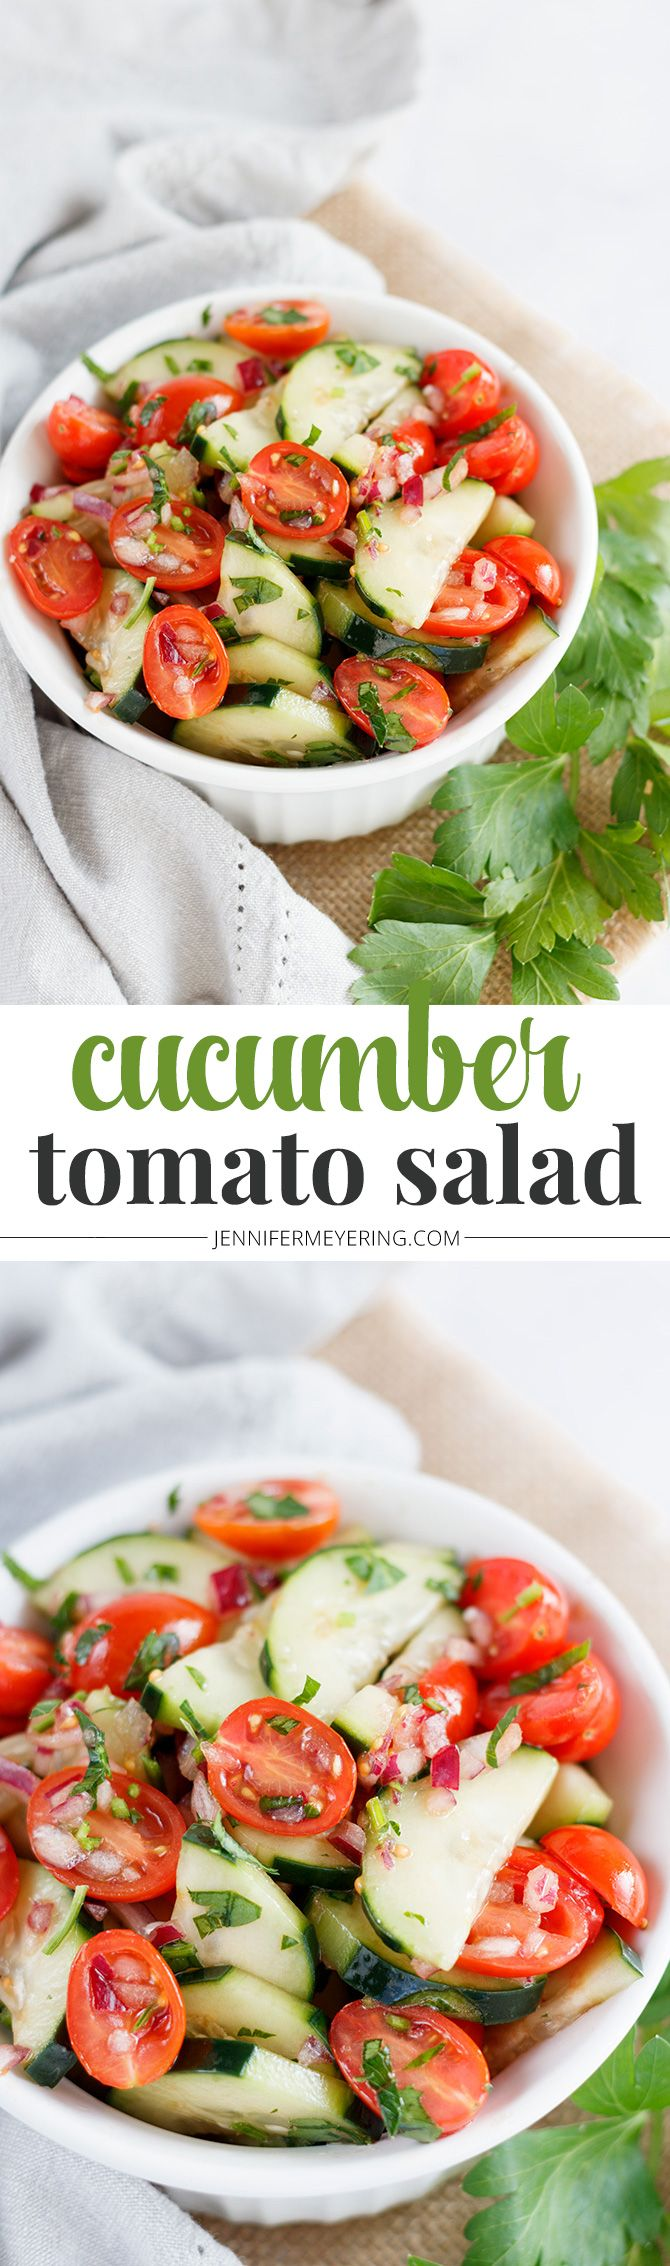 Cucumber Tomato Salad - JenniferMeyering.com